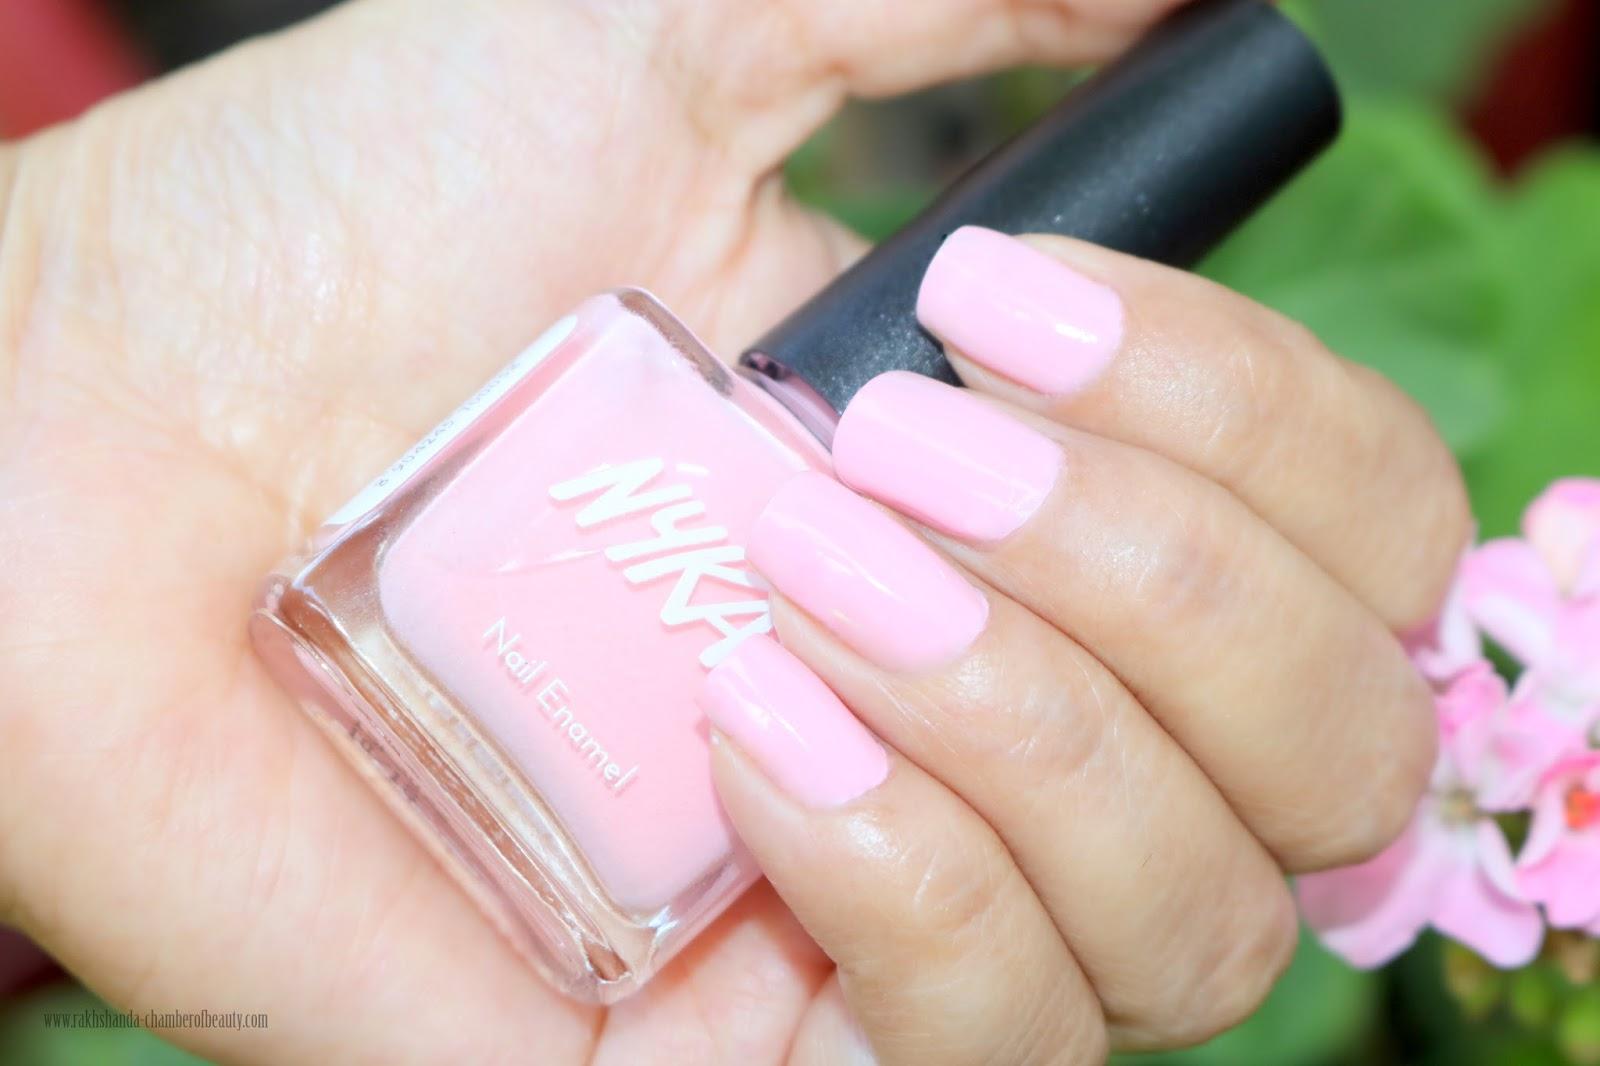 NOTD - Nykaa Pastel Nail Enamel Cotton Candy